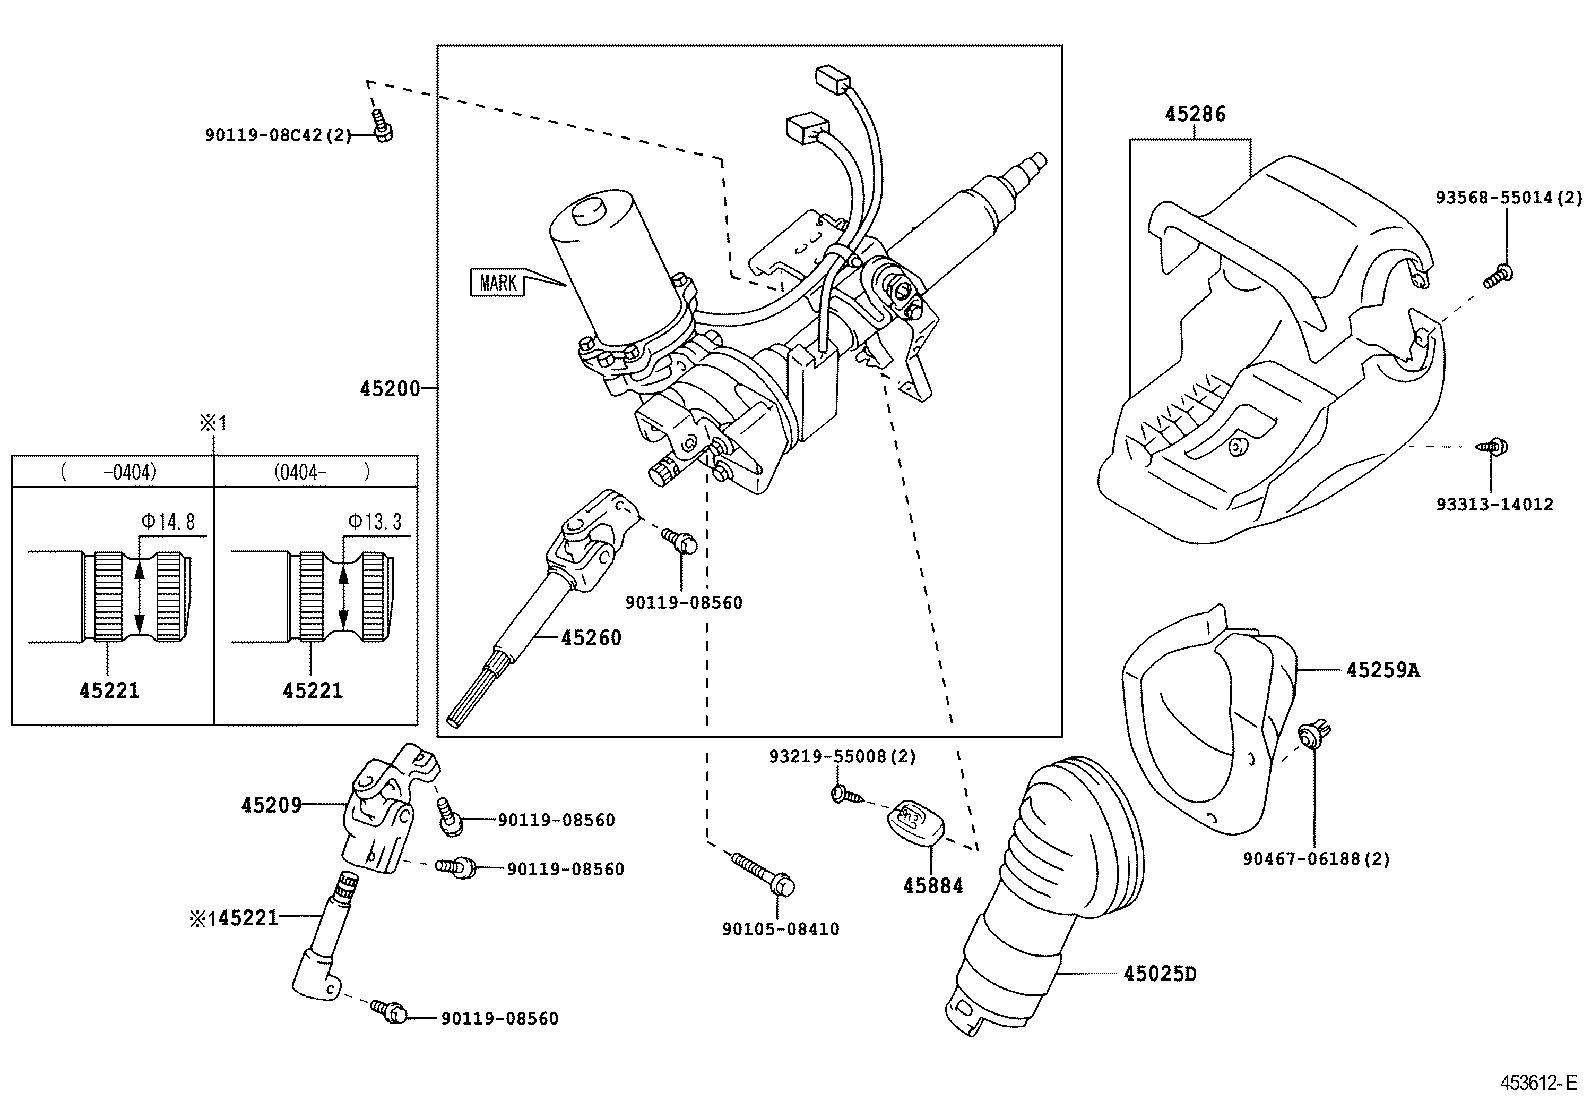 Toyota Priusnhw20l-aheebw - Powertrain-chassis